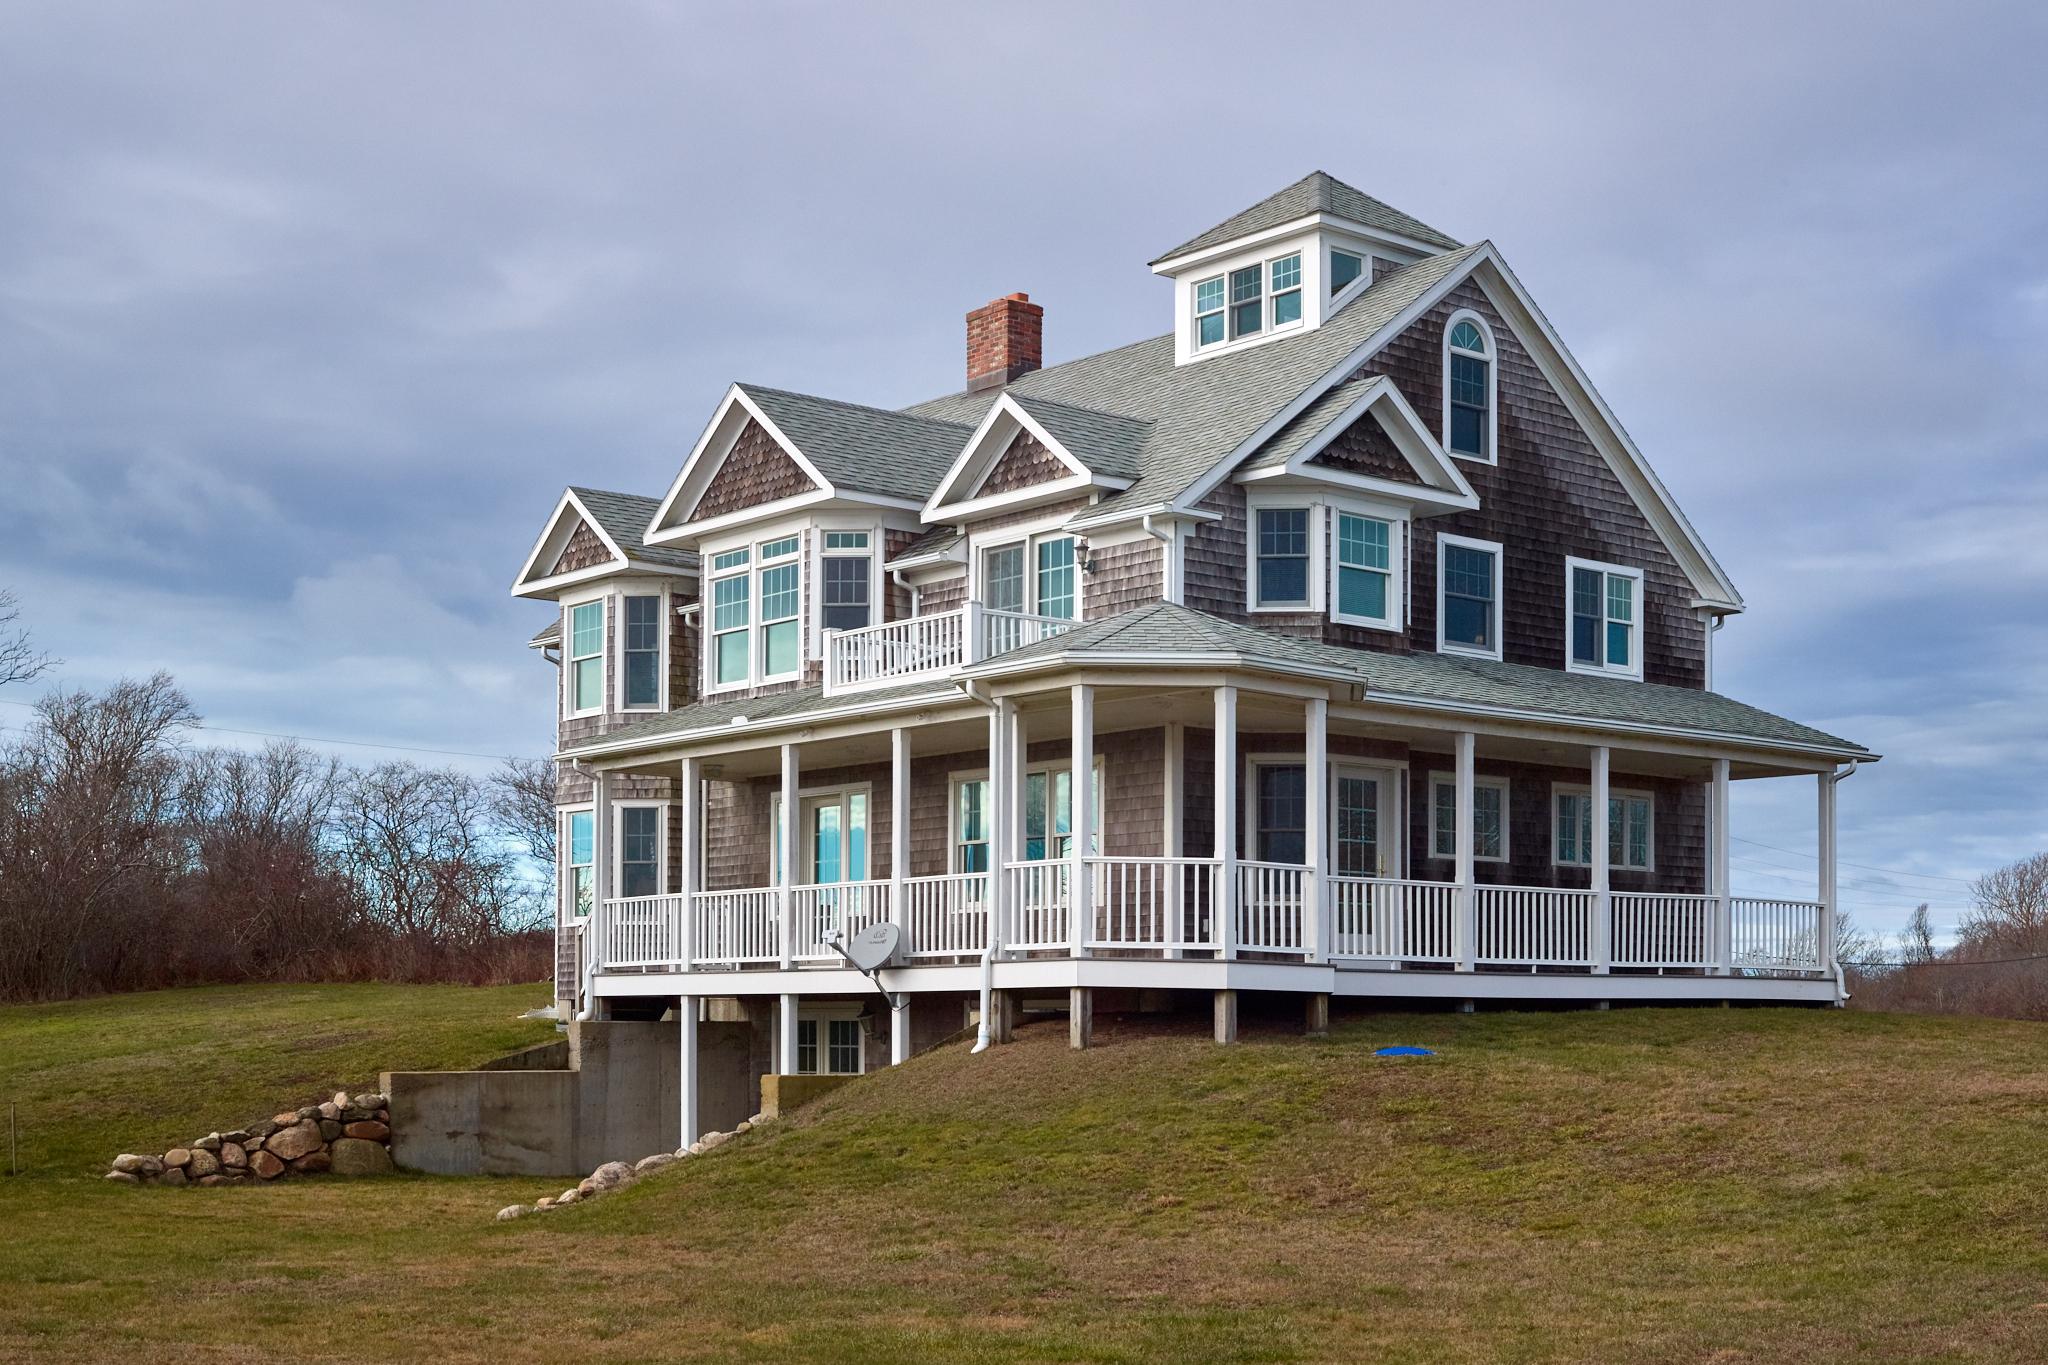 Moradia para Venda às Mohegan Cottage 1671 Mohegan Trail Block Island, Rhode Island 02807 Estados Unidos